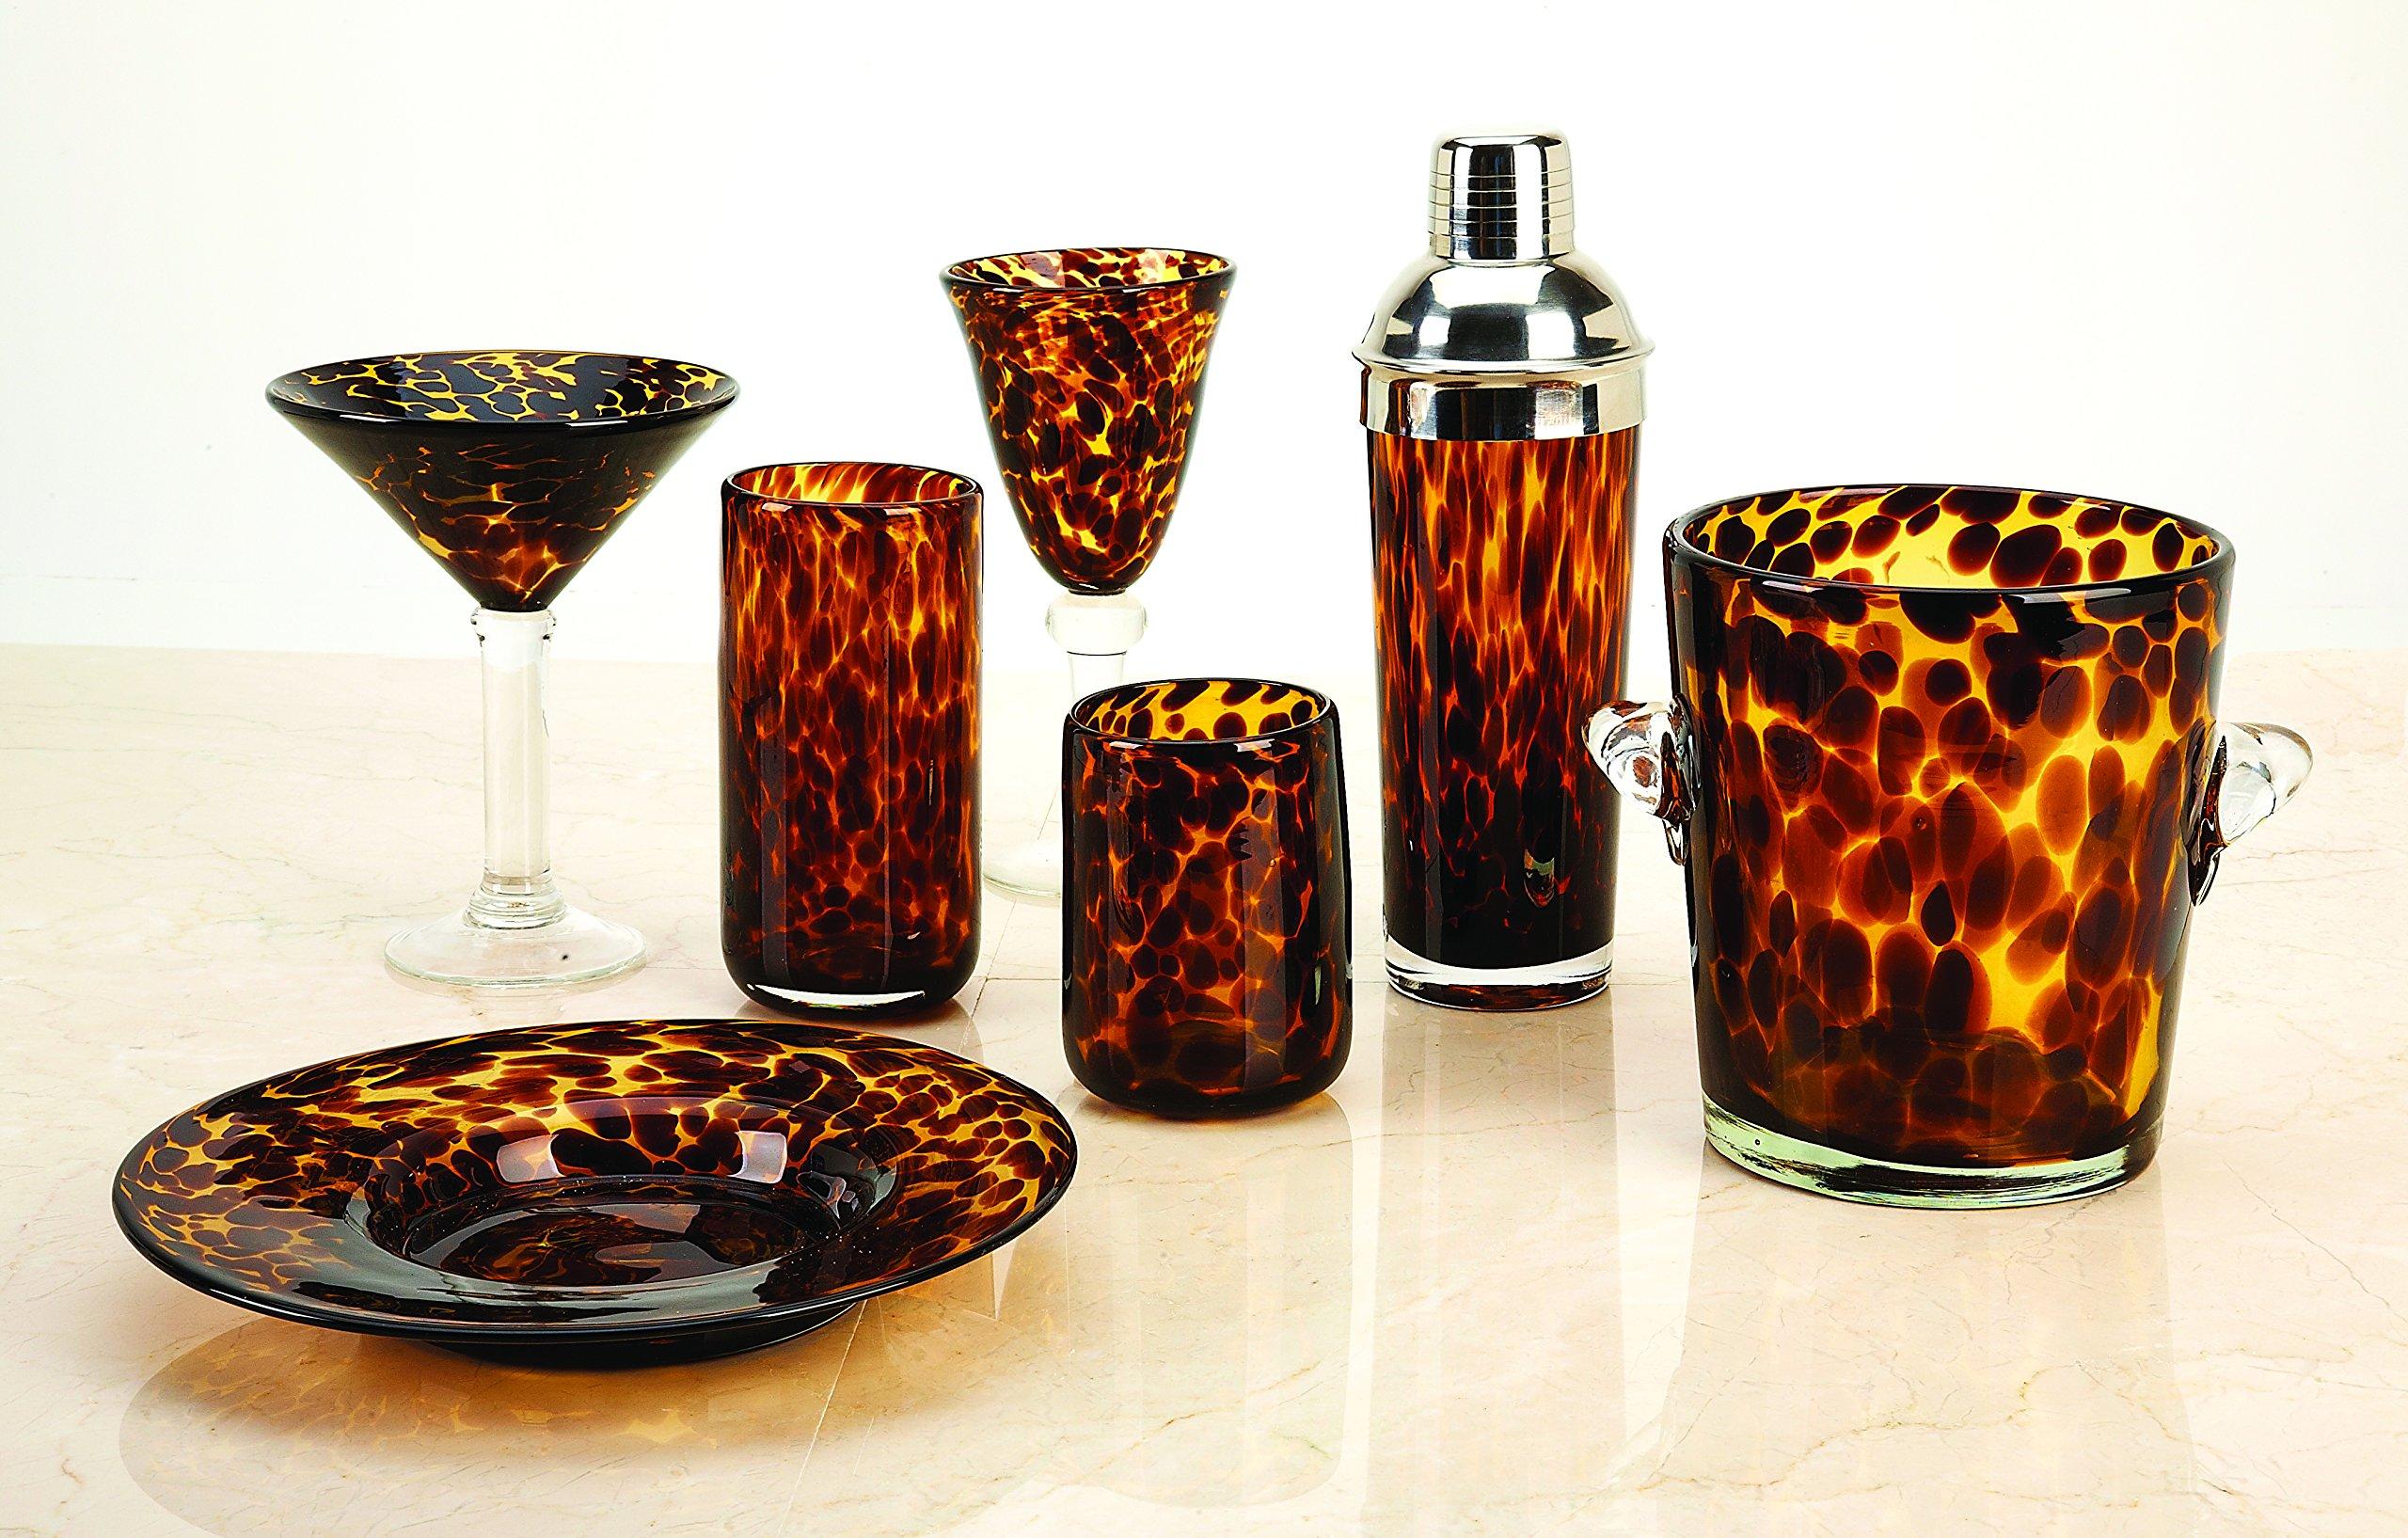 Impulse Tortoise Rocks Glass, Brown/Spotted, Set of 4